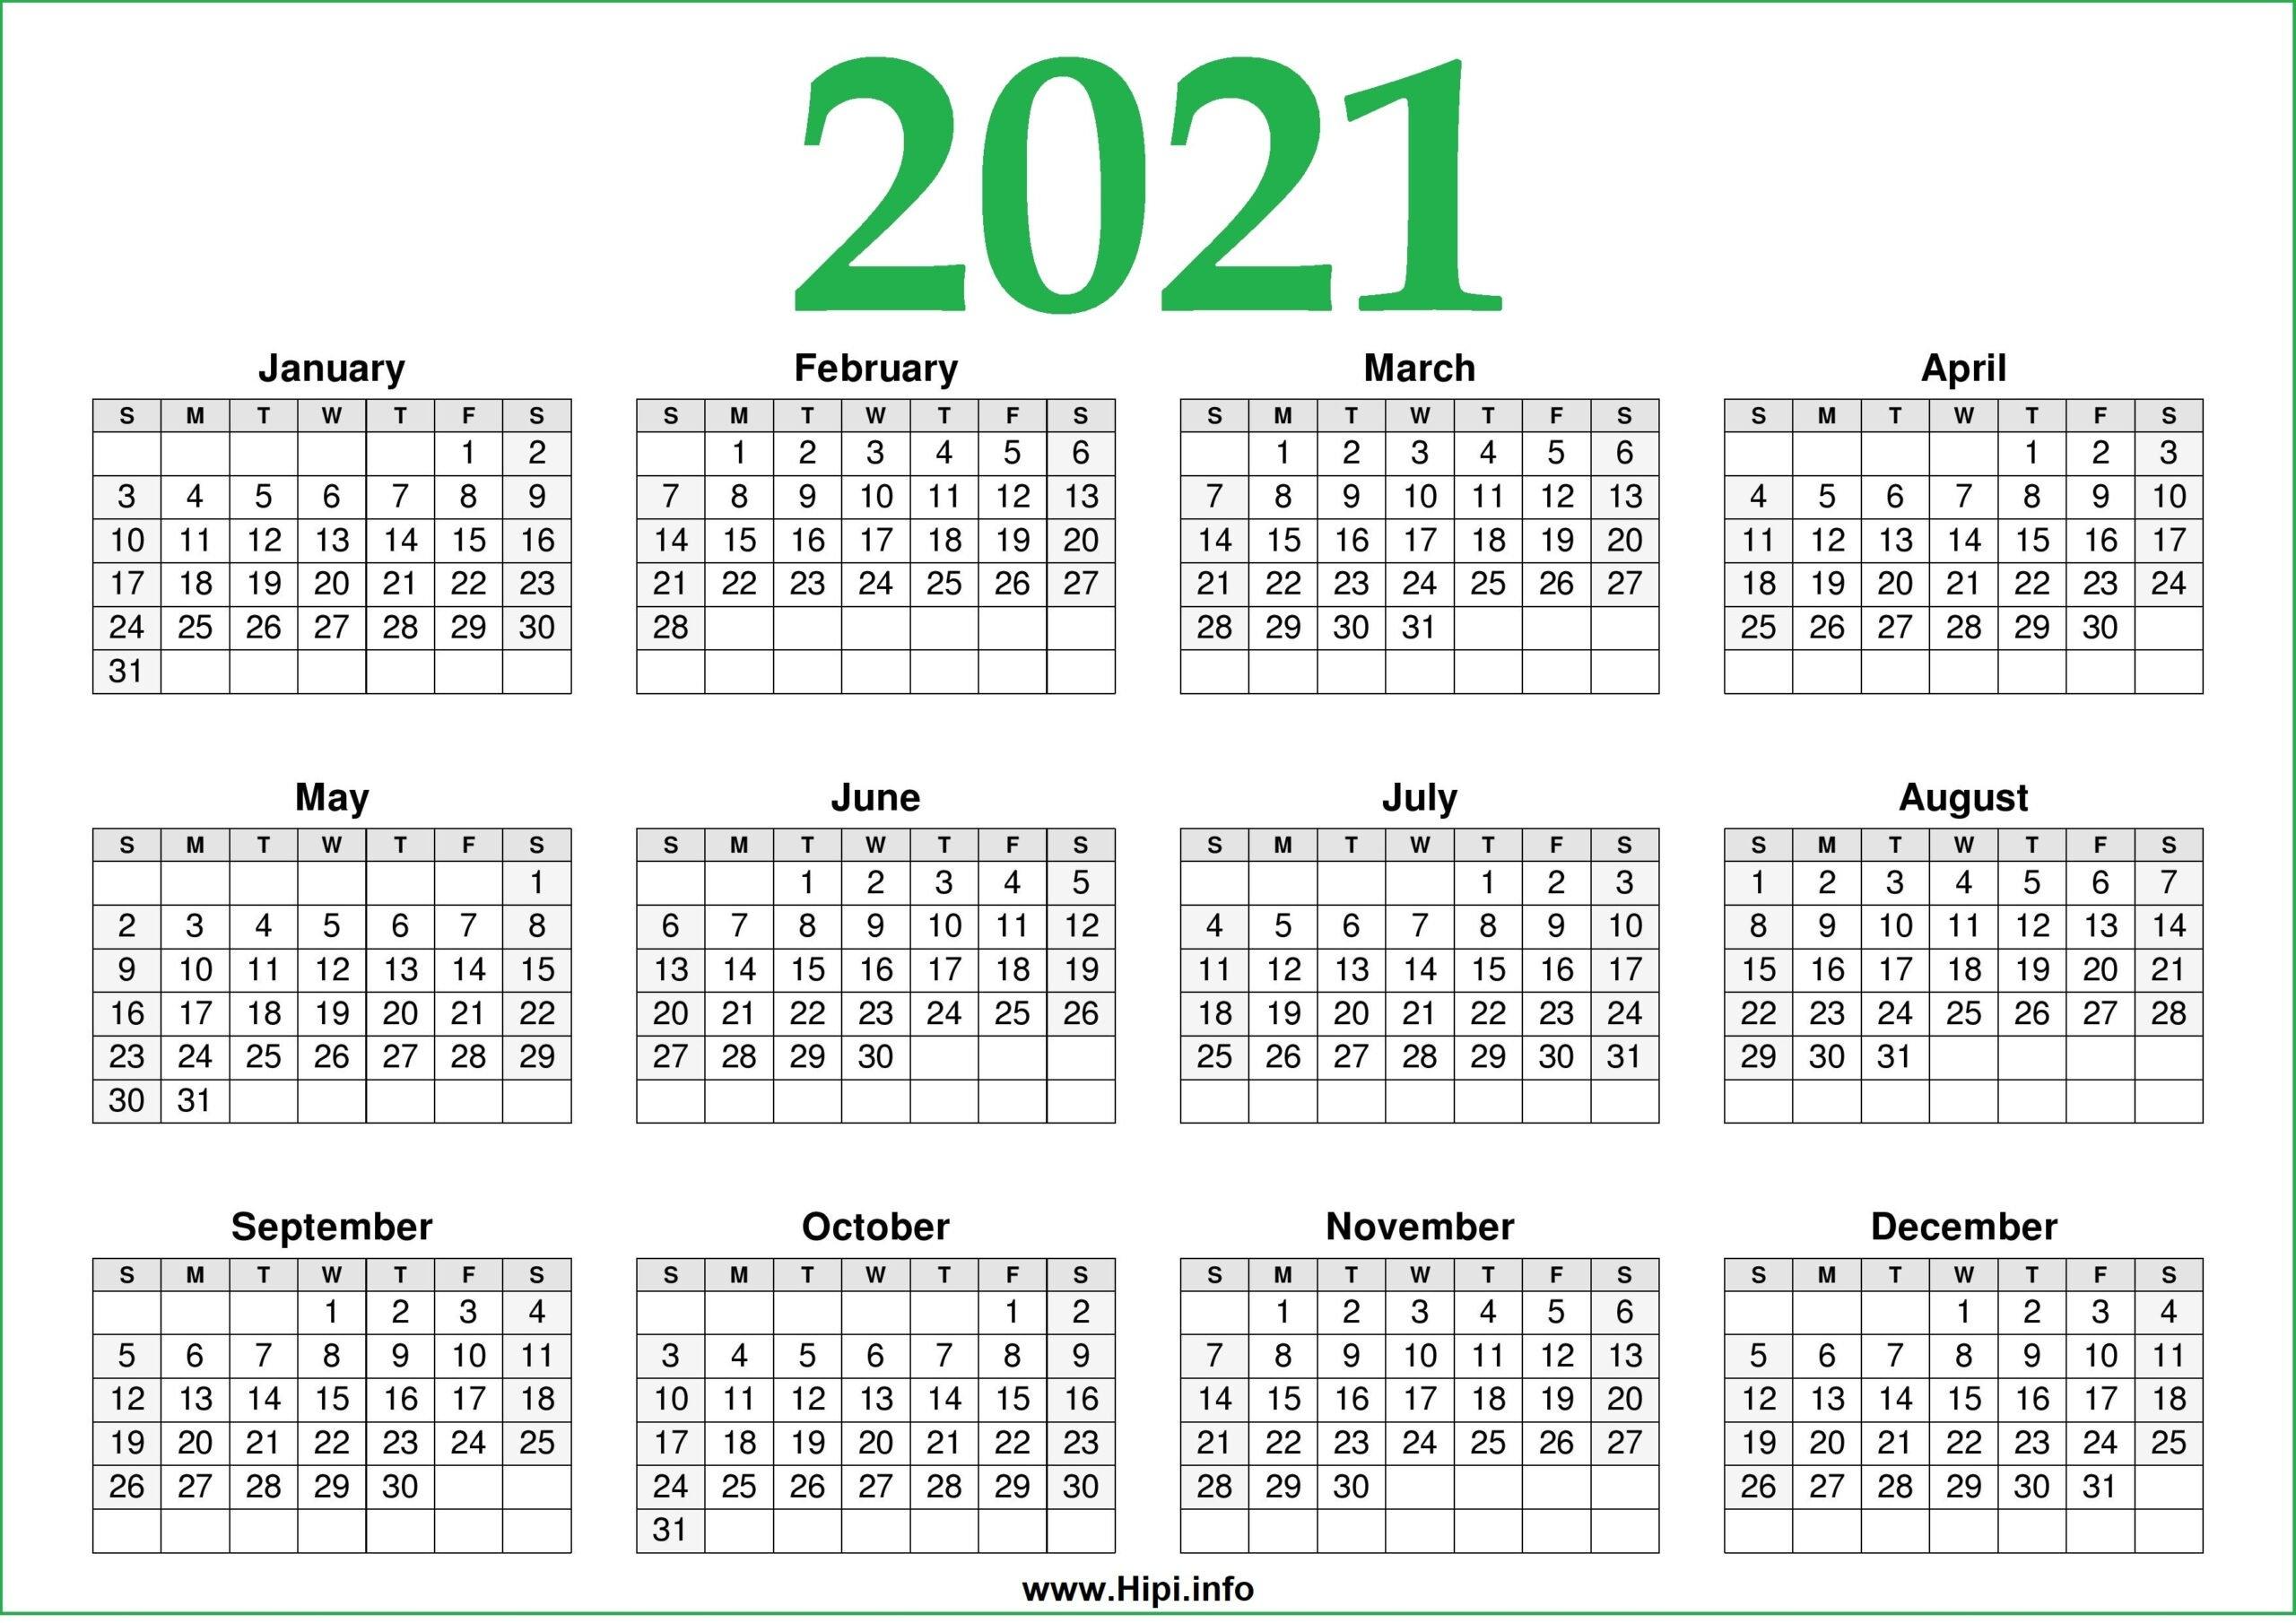 Table Calendar 2021 Psd Free Download - Printablecalendarr in Church Calendar 2021 Psd